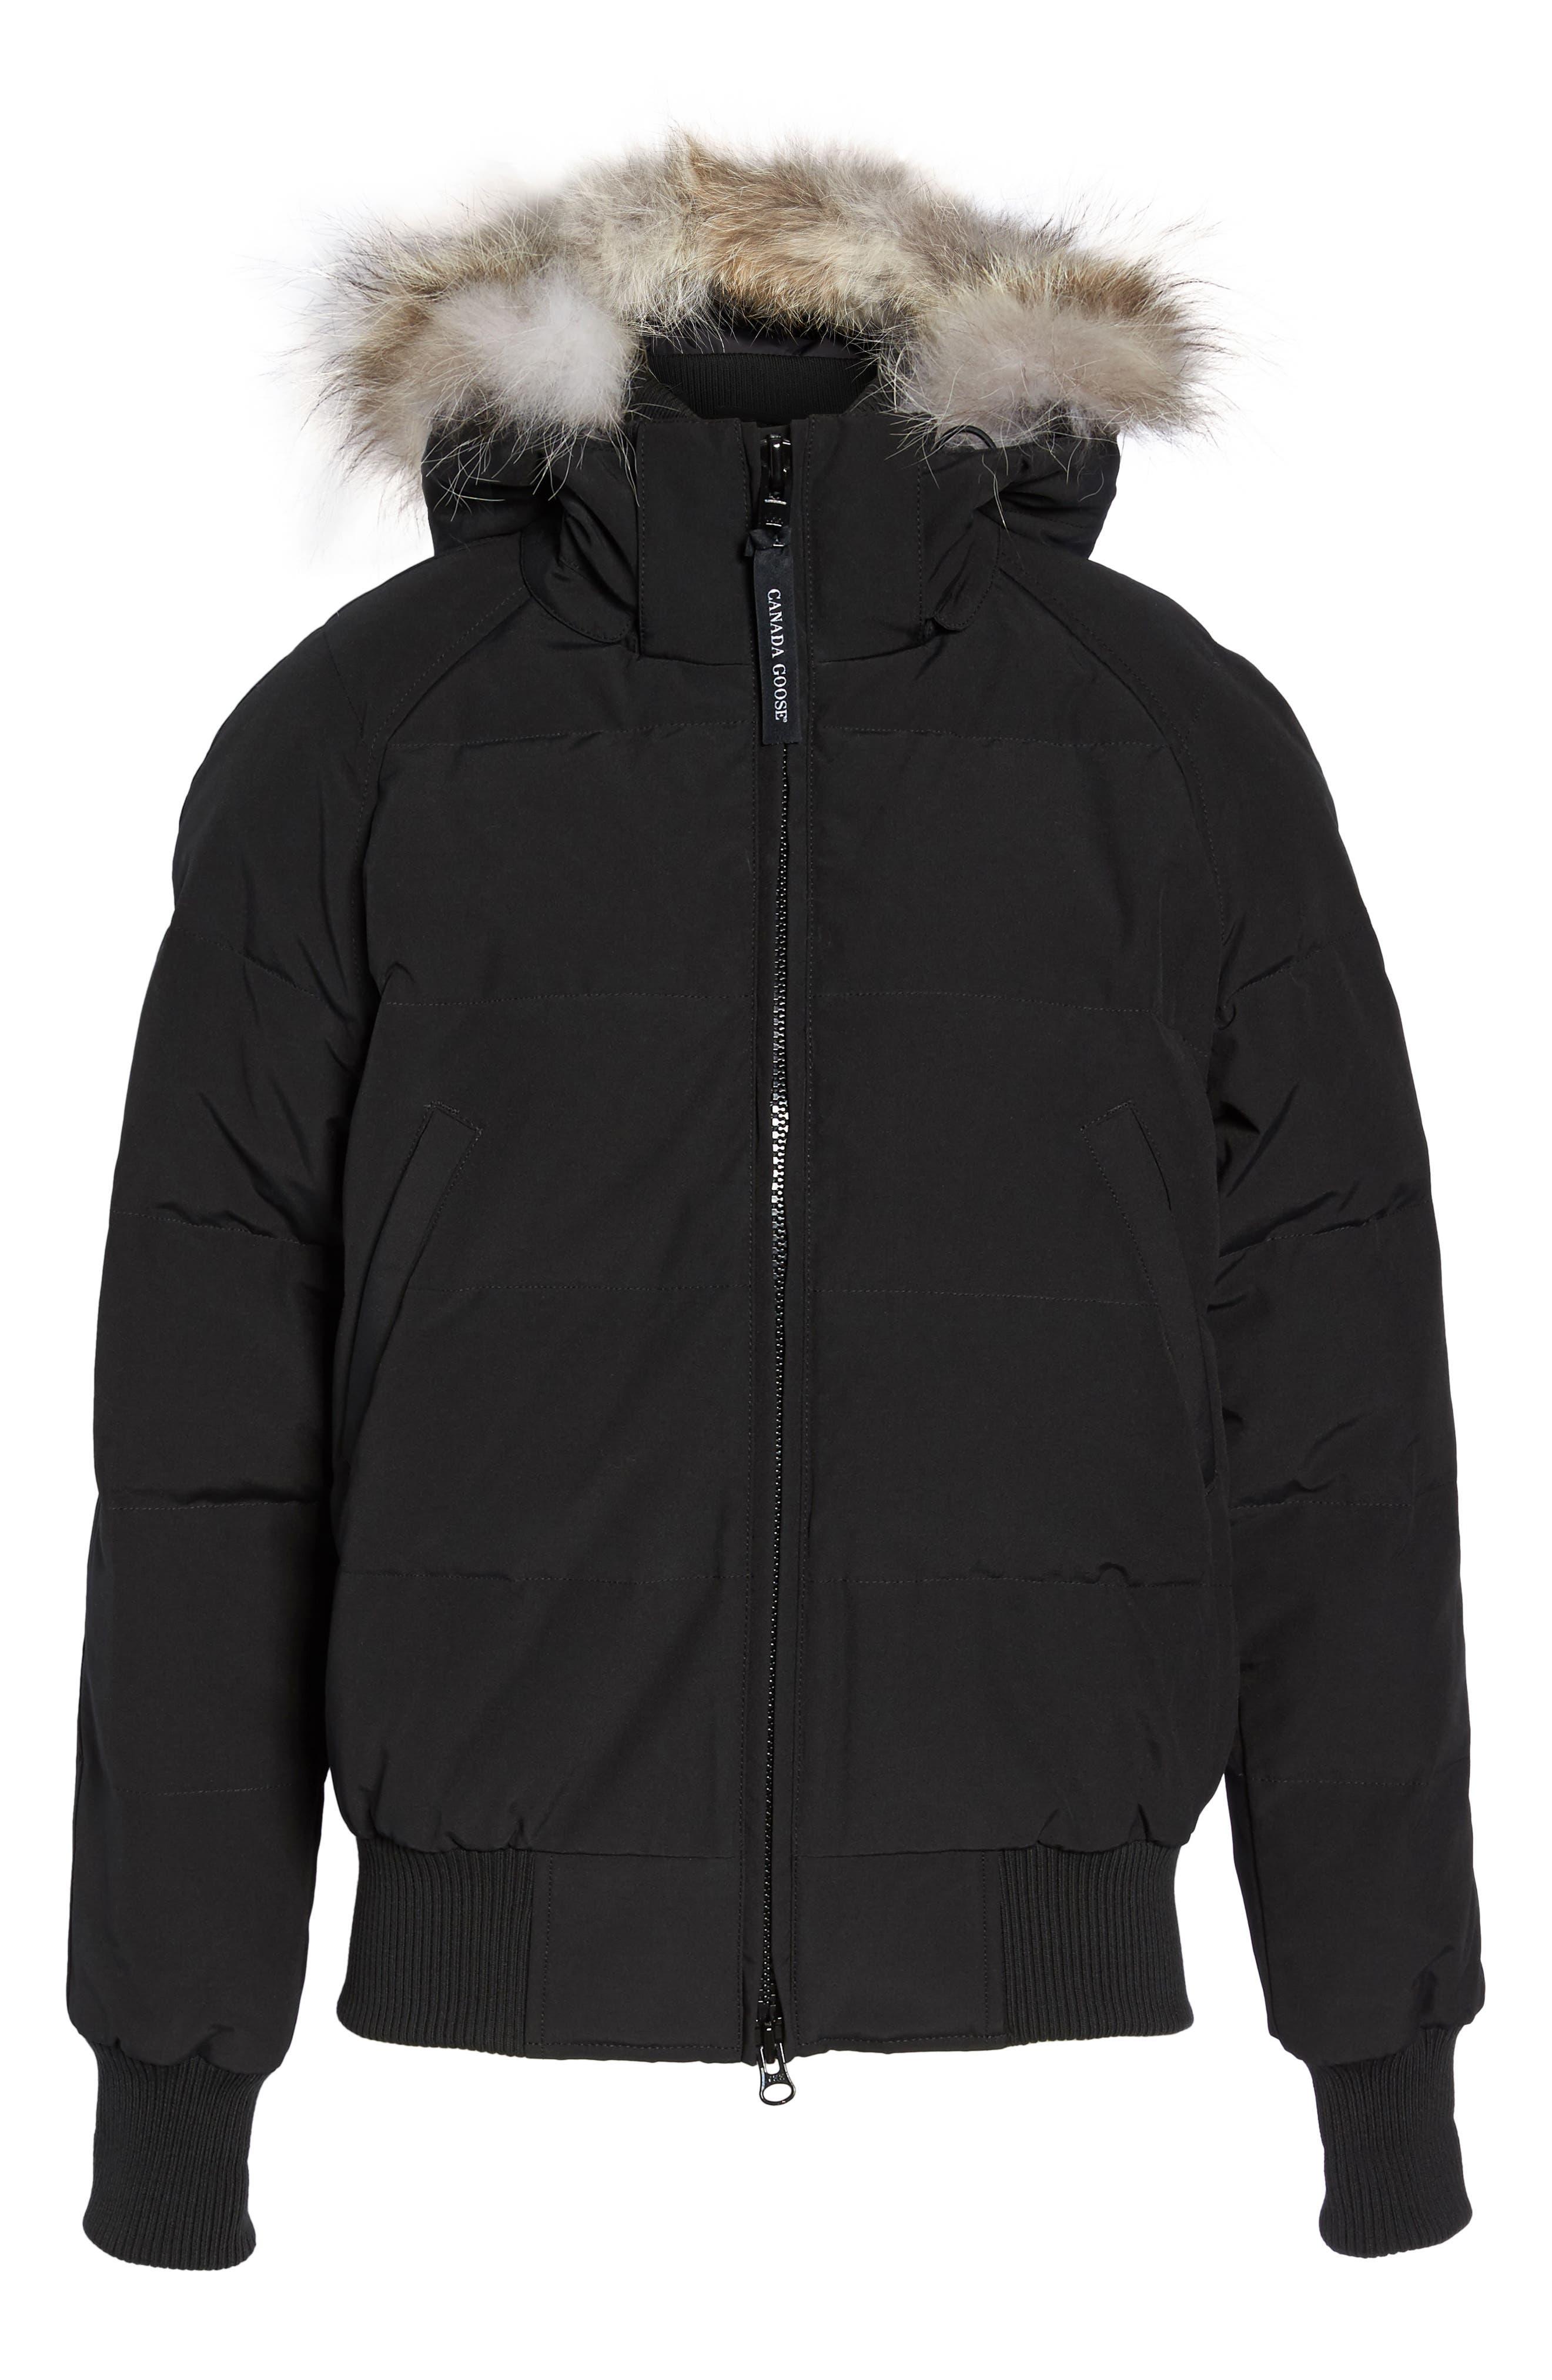 'Savona' Bomber Jacket with Genuine Coyote Fur Trim,                             Alternate thumbnail 7, color,                             Black